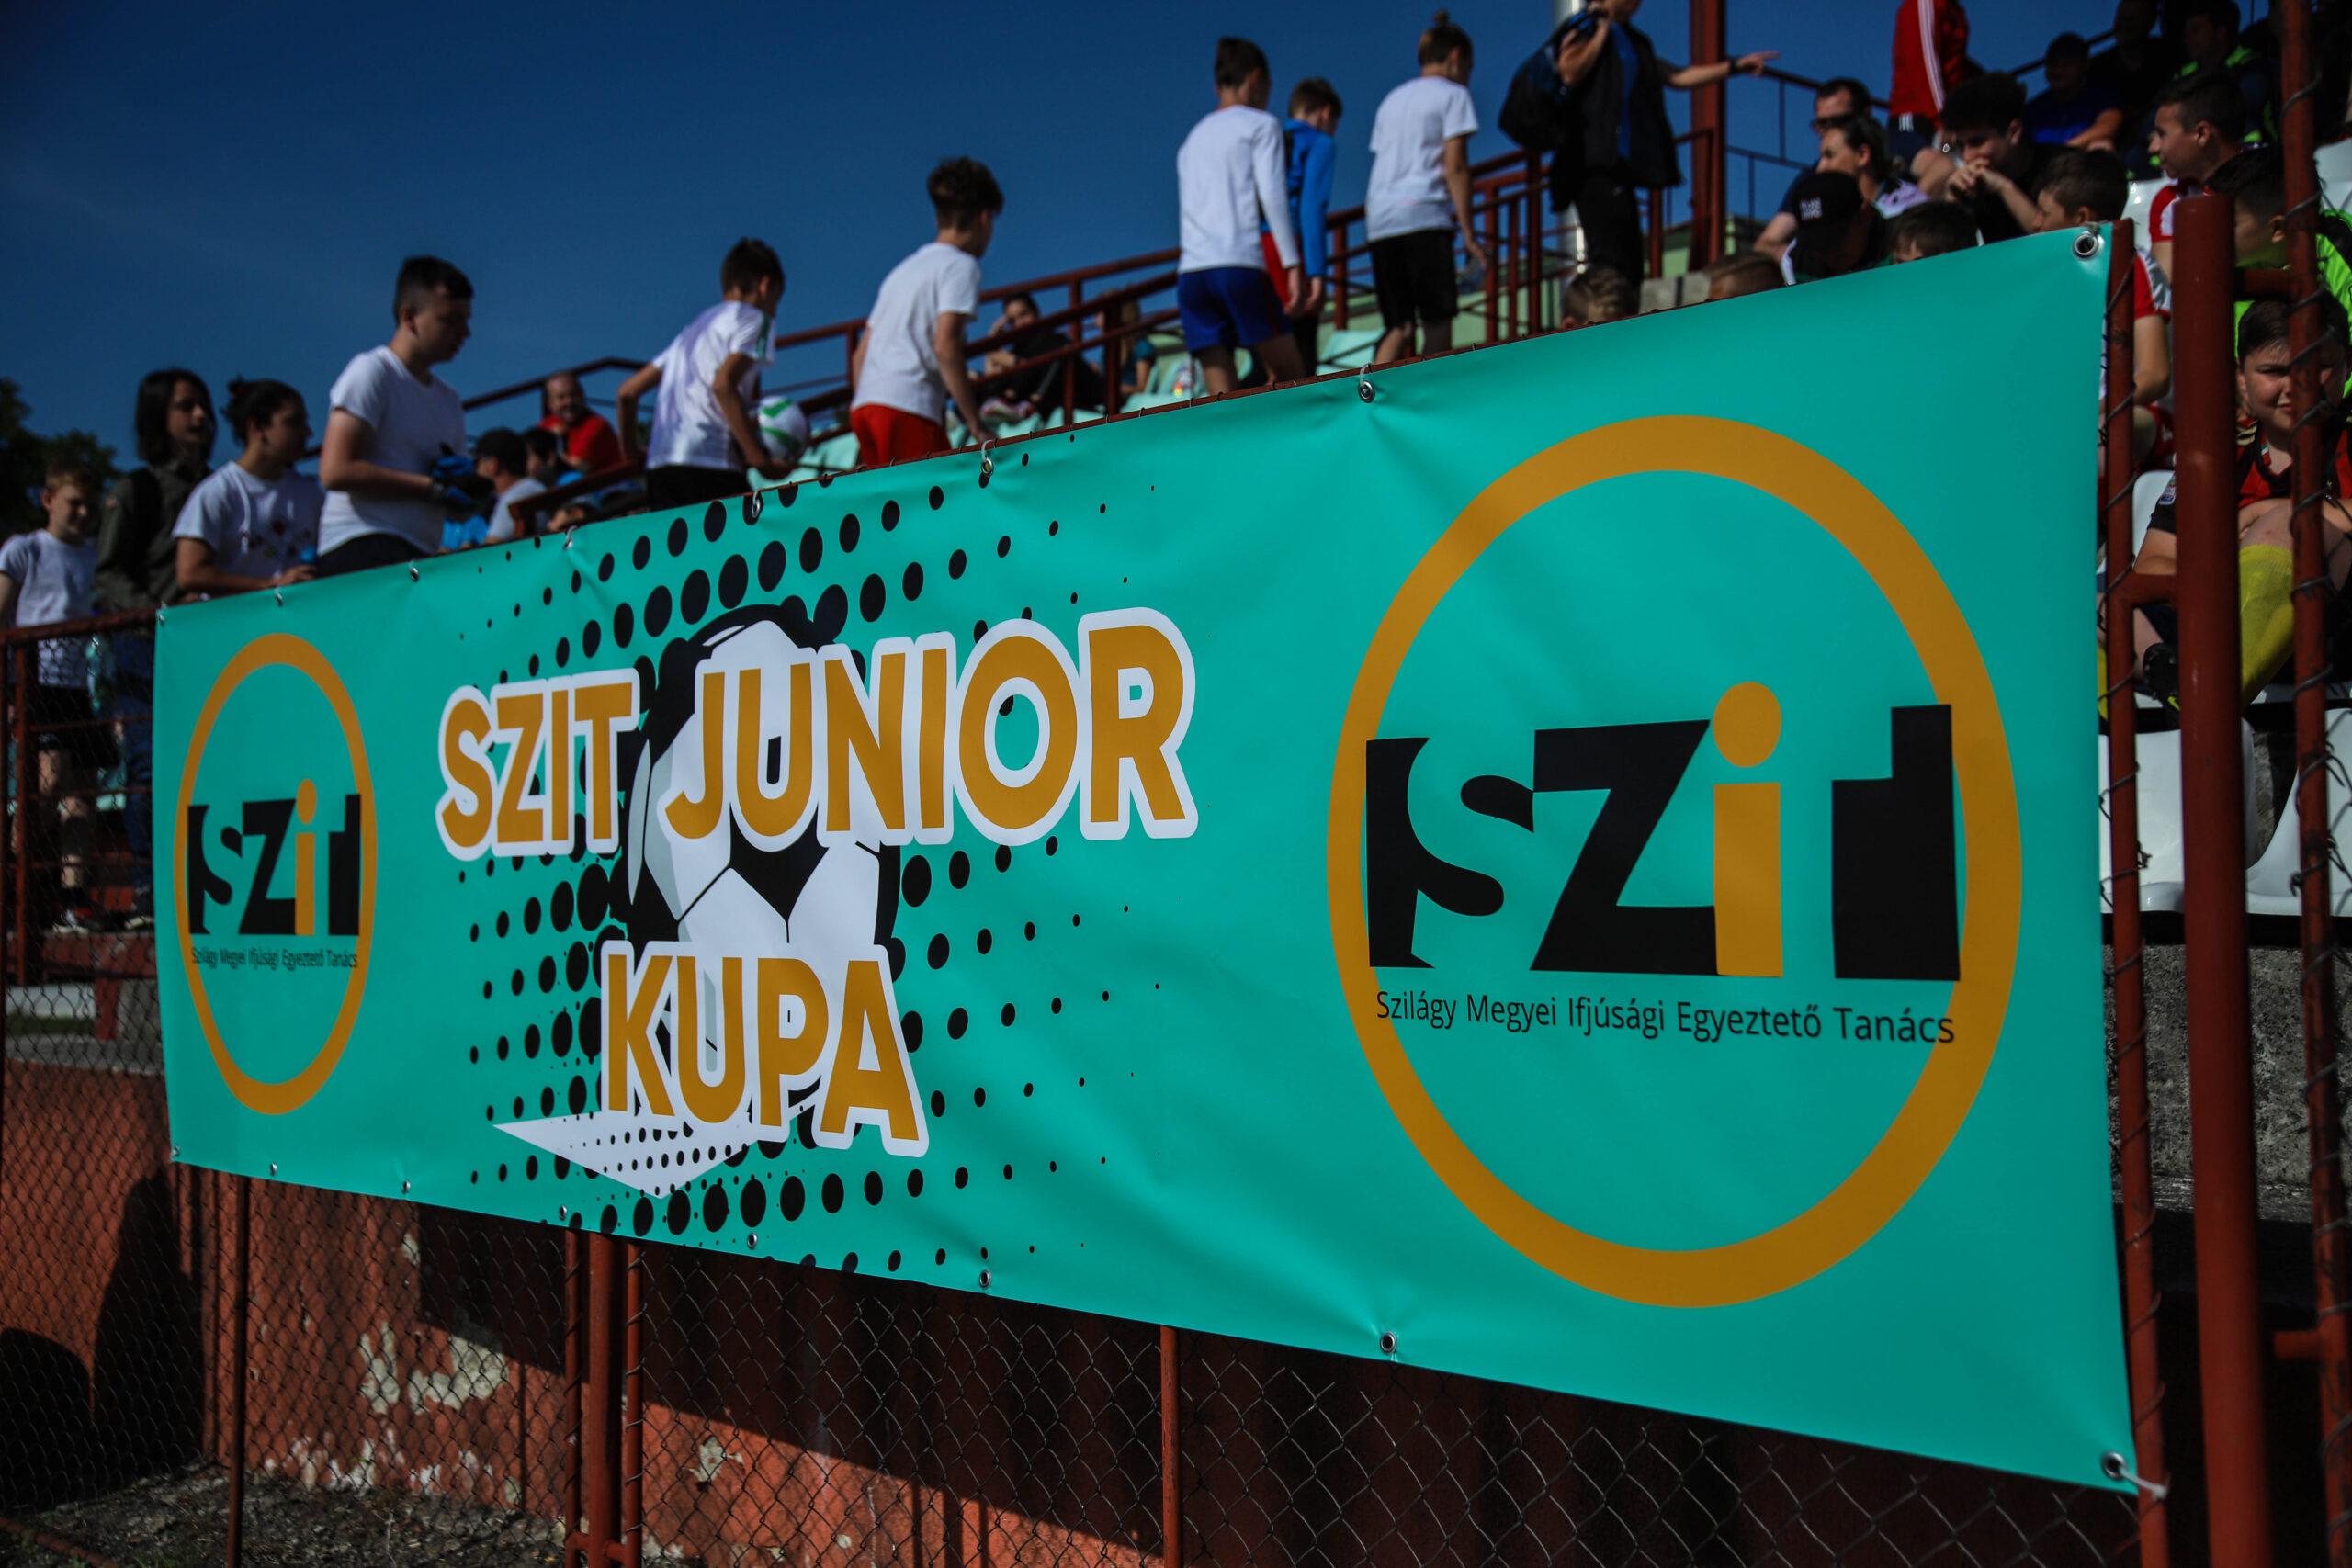 SZIT Junior Kupa 2021 🙂🟢⚫⚽️🇭🇺